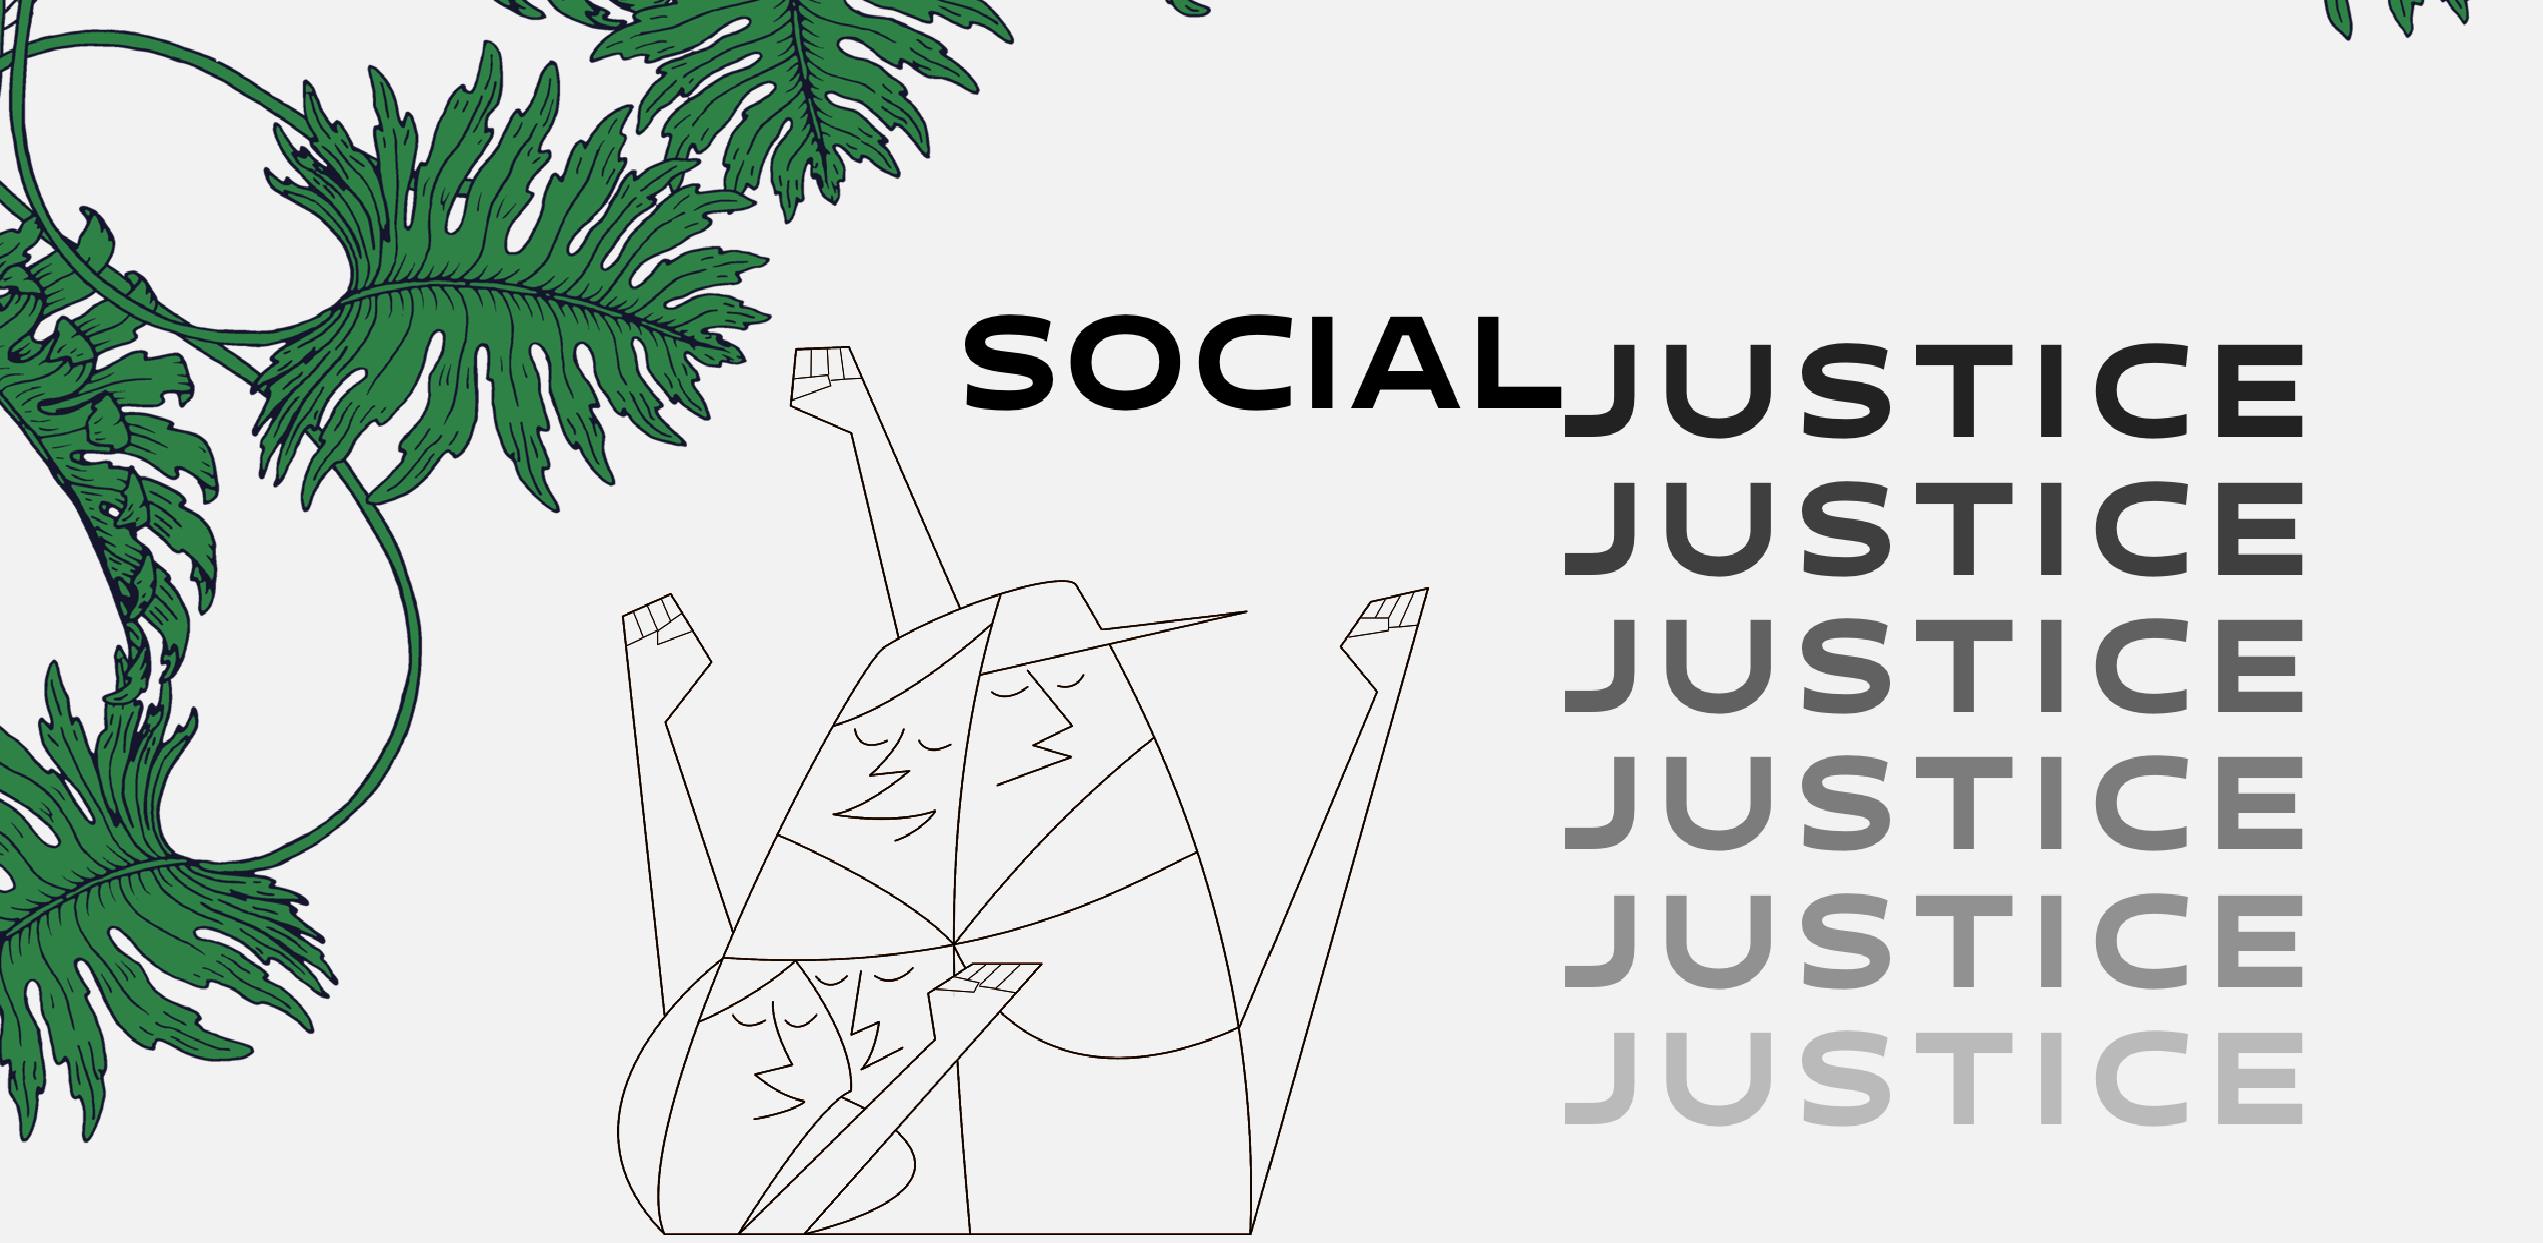 BALDWIN RIVERA BOGGS SOCIAL JUSTICE HUB